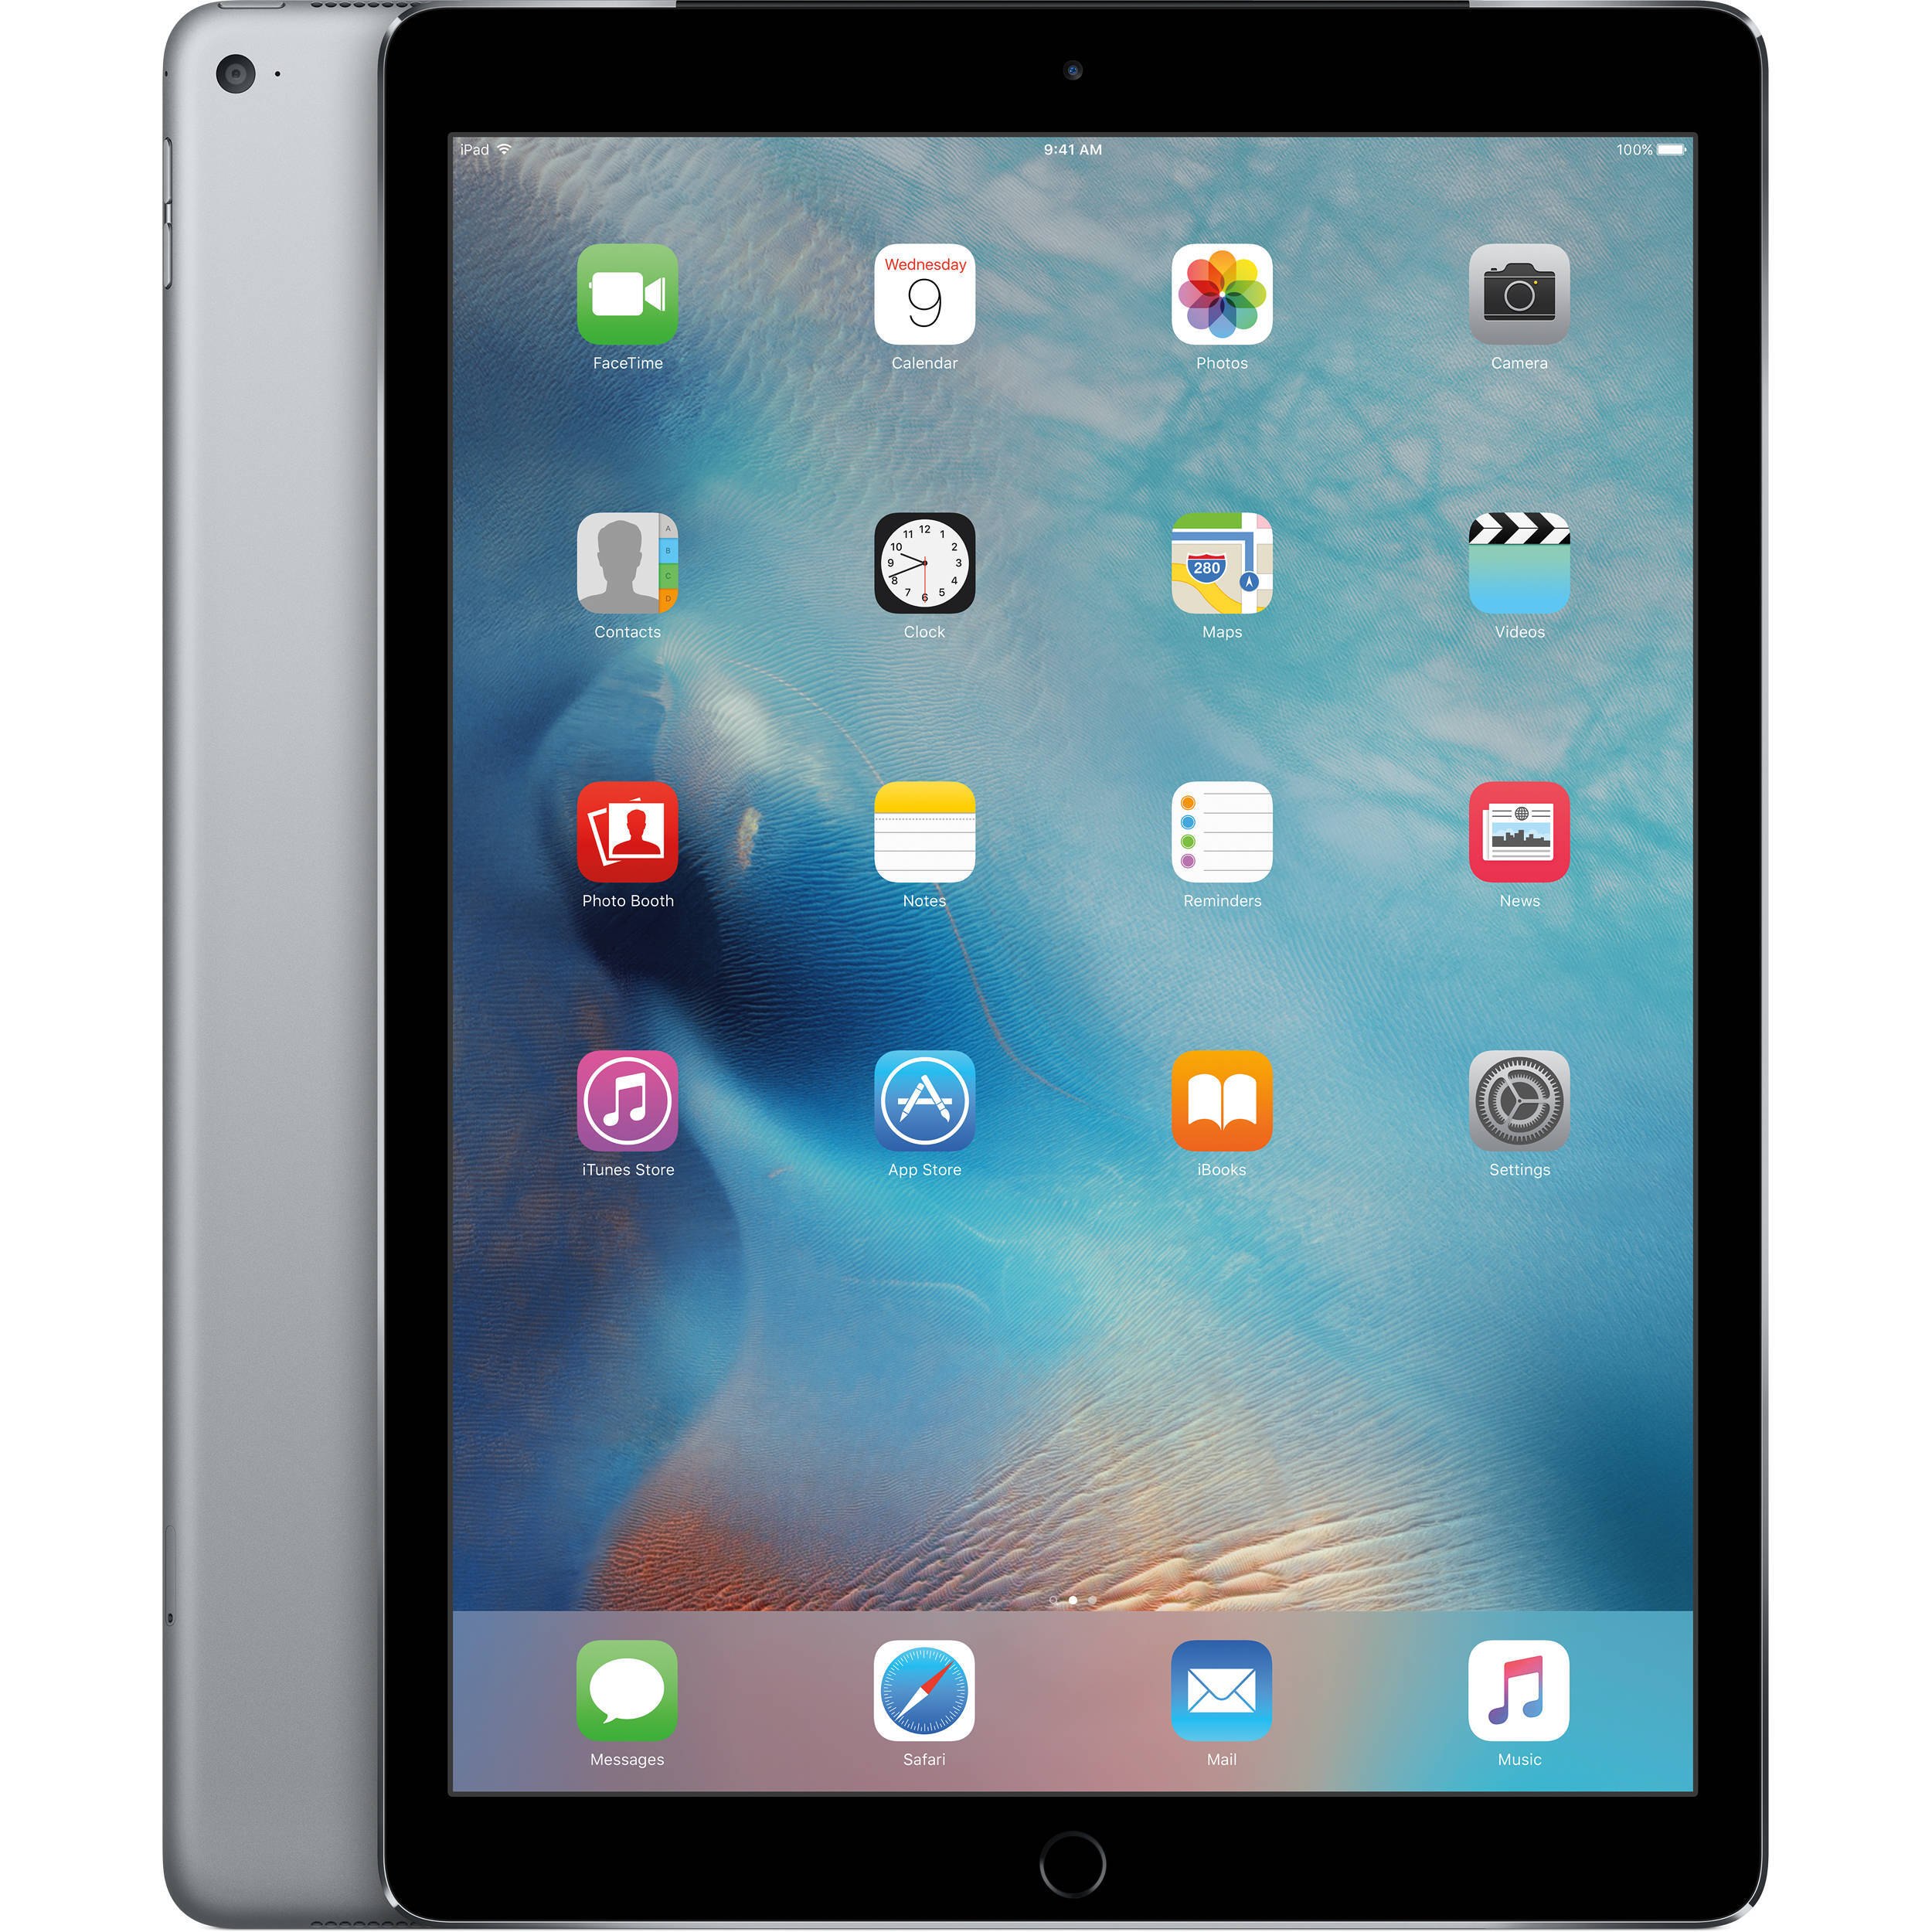 https://city.com.ua/newspic/reviews/apple-ipad-pro-32gb-wi-fi-space-gray.jpg